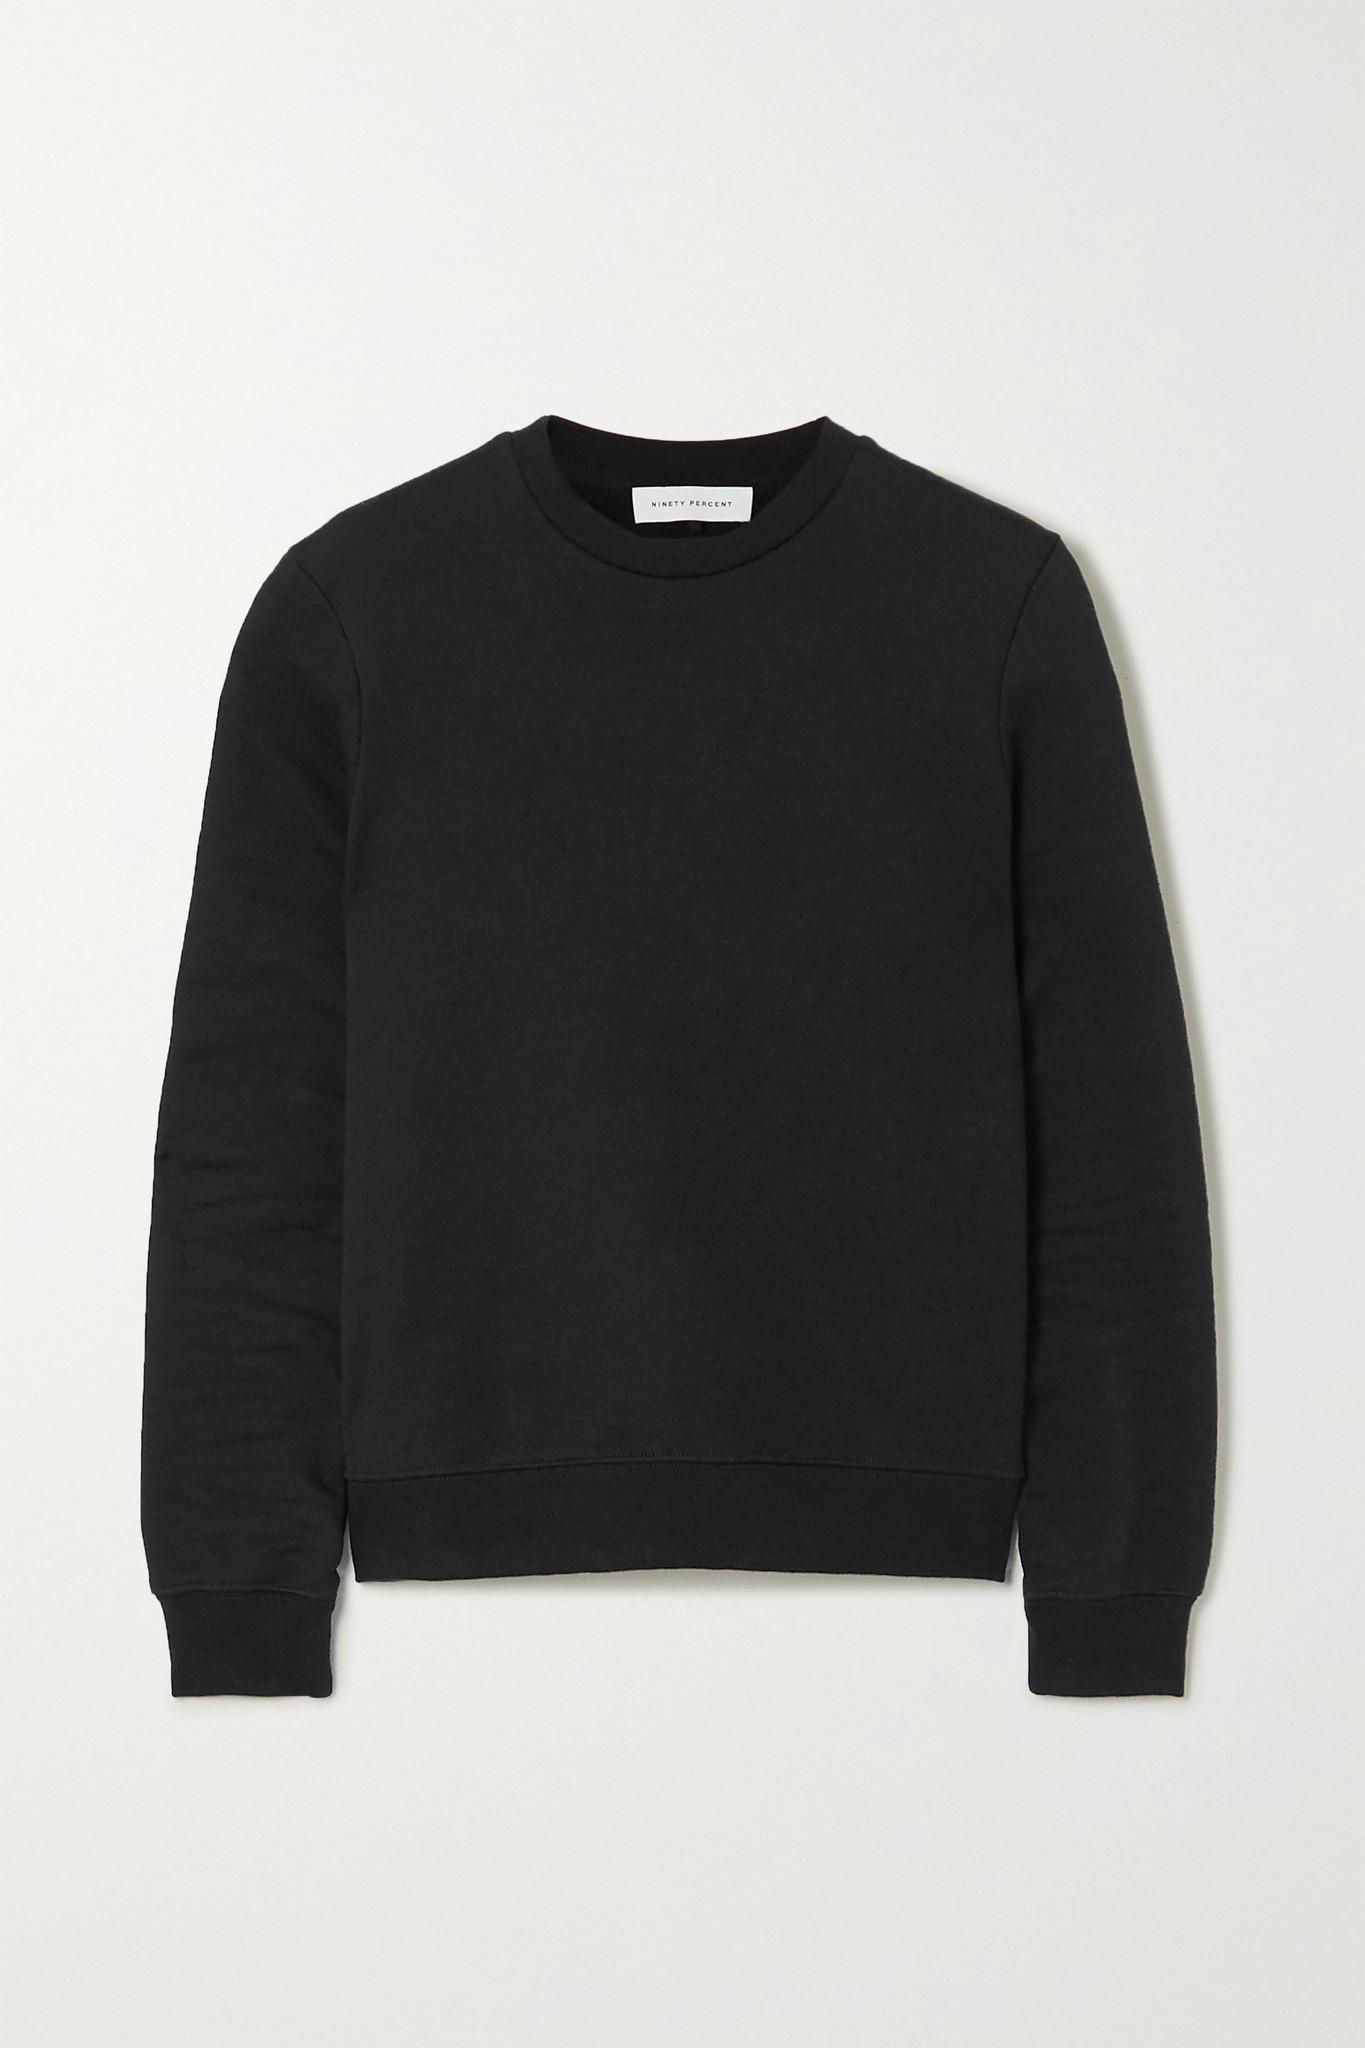 NINETY PERCENT - 【net Sustain】stephanie 有机纯棉毛巾布卫衣 - 黑色 - x small